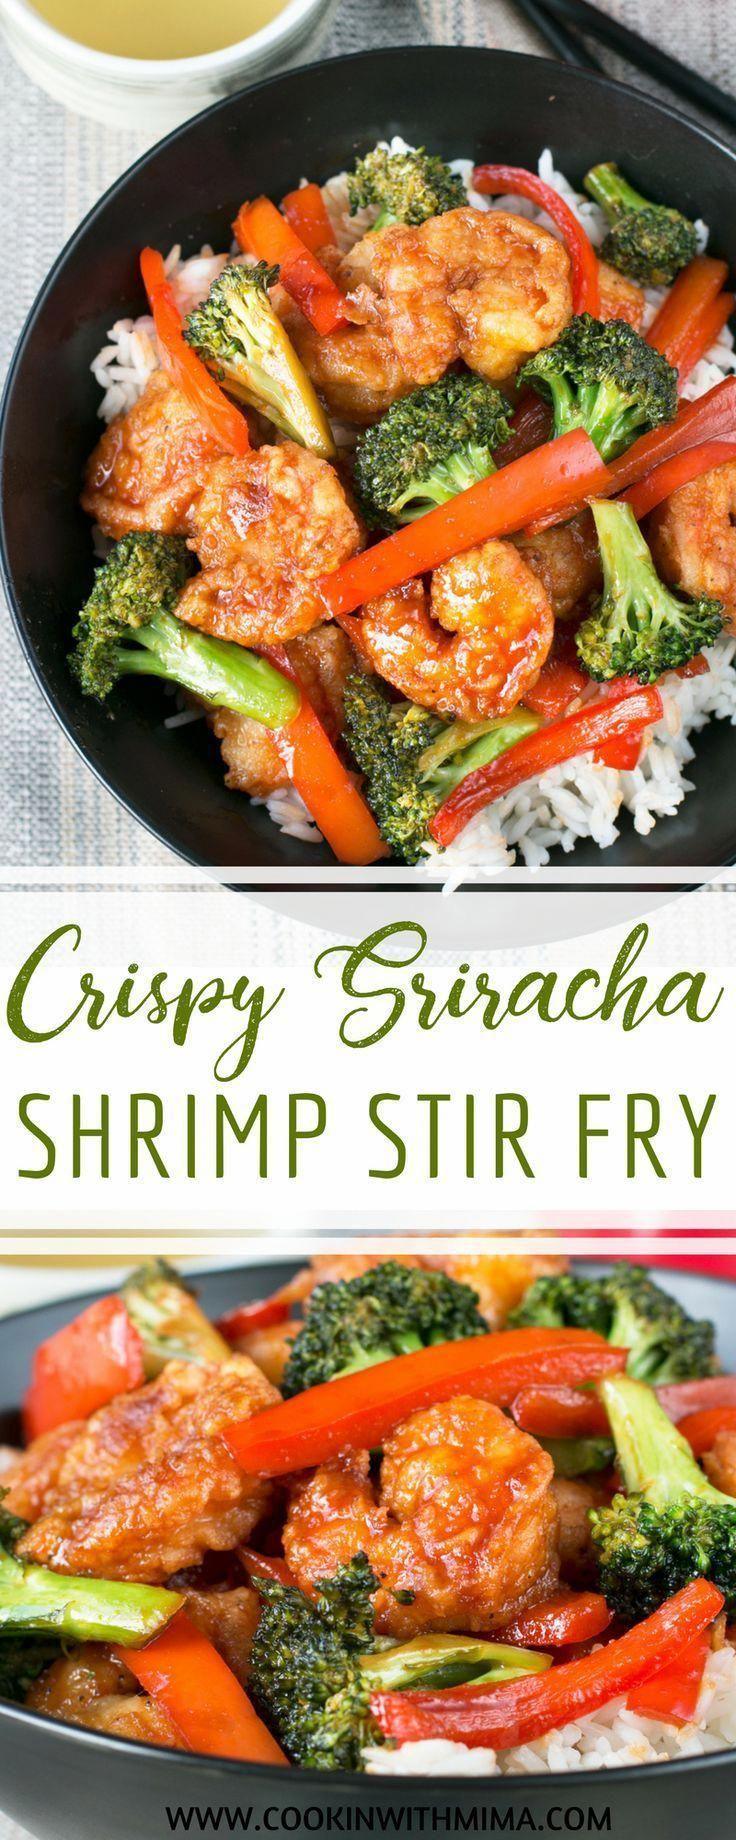 Crispy Sriracha Shrimp Stir Fry   Asian Recipes   Seafood   Best Stir Fry Recipes   Sriracha Recipes   Cookin With Mima   #sriracha #shrimp #stirfry #cookinwithmima #shrimprecipes #stirfryshrimp Crispy Sriracha Shrimp Stir Fry   Asian Recipes   Seafood   Best Stir Fry Recipes   Sriracha Recipes   Cookin With Mima   #sriracha #shrimp #stirfry #cookinwithmima #shrimprecipes #stirfryshrimp